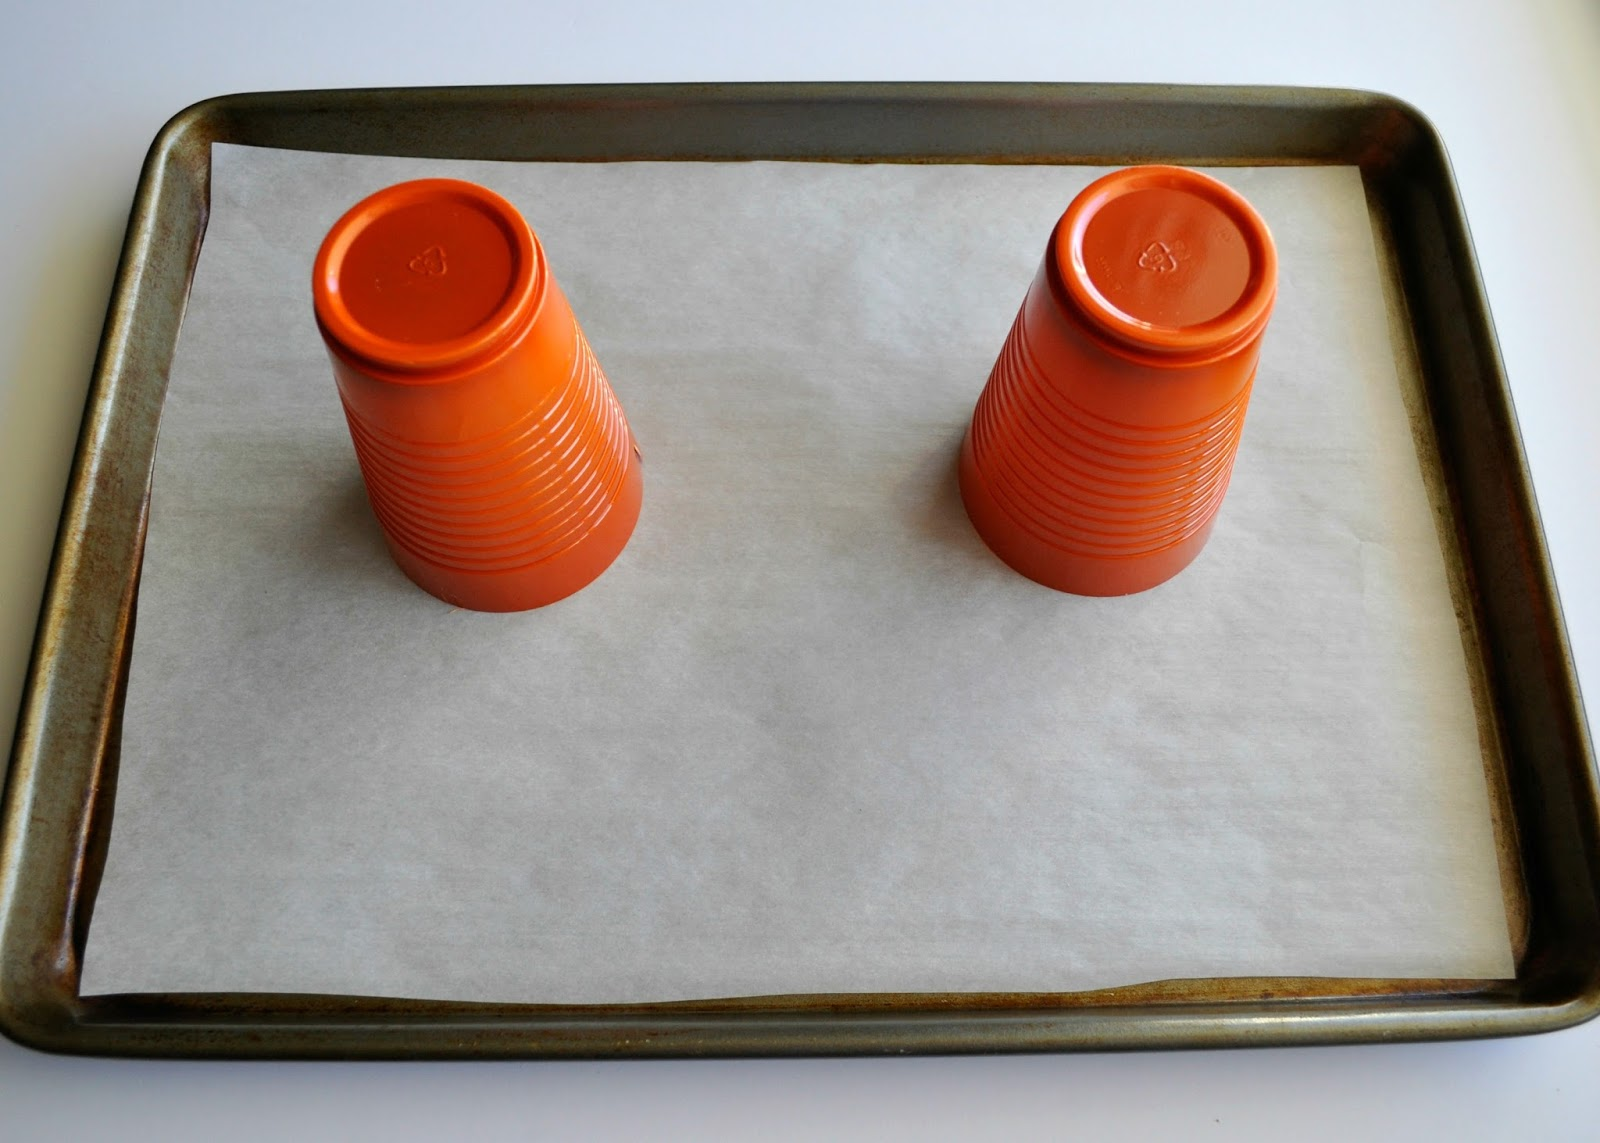 Melted Plastic Cup Pumpkins